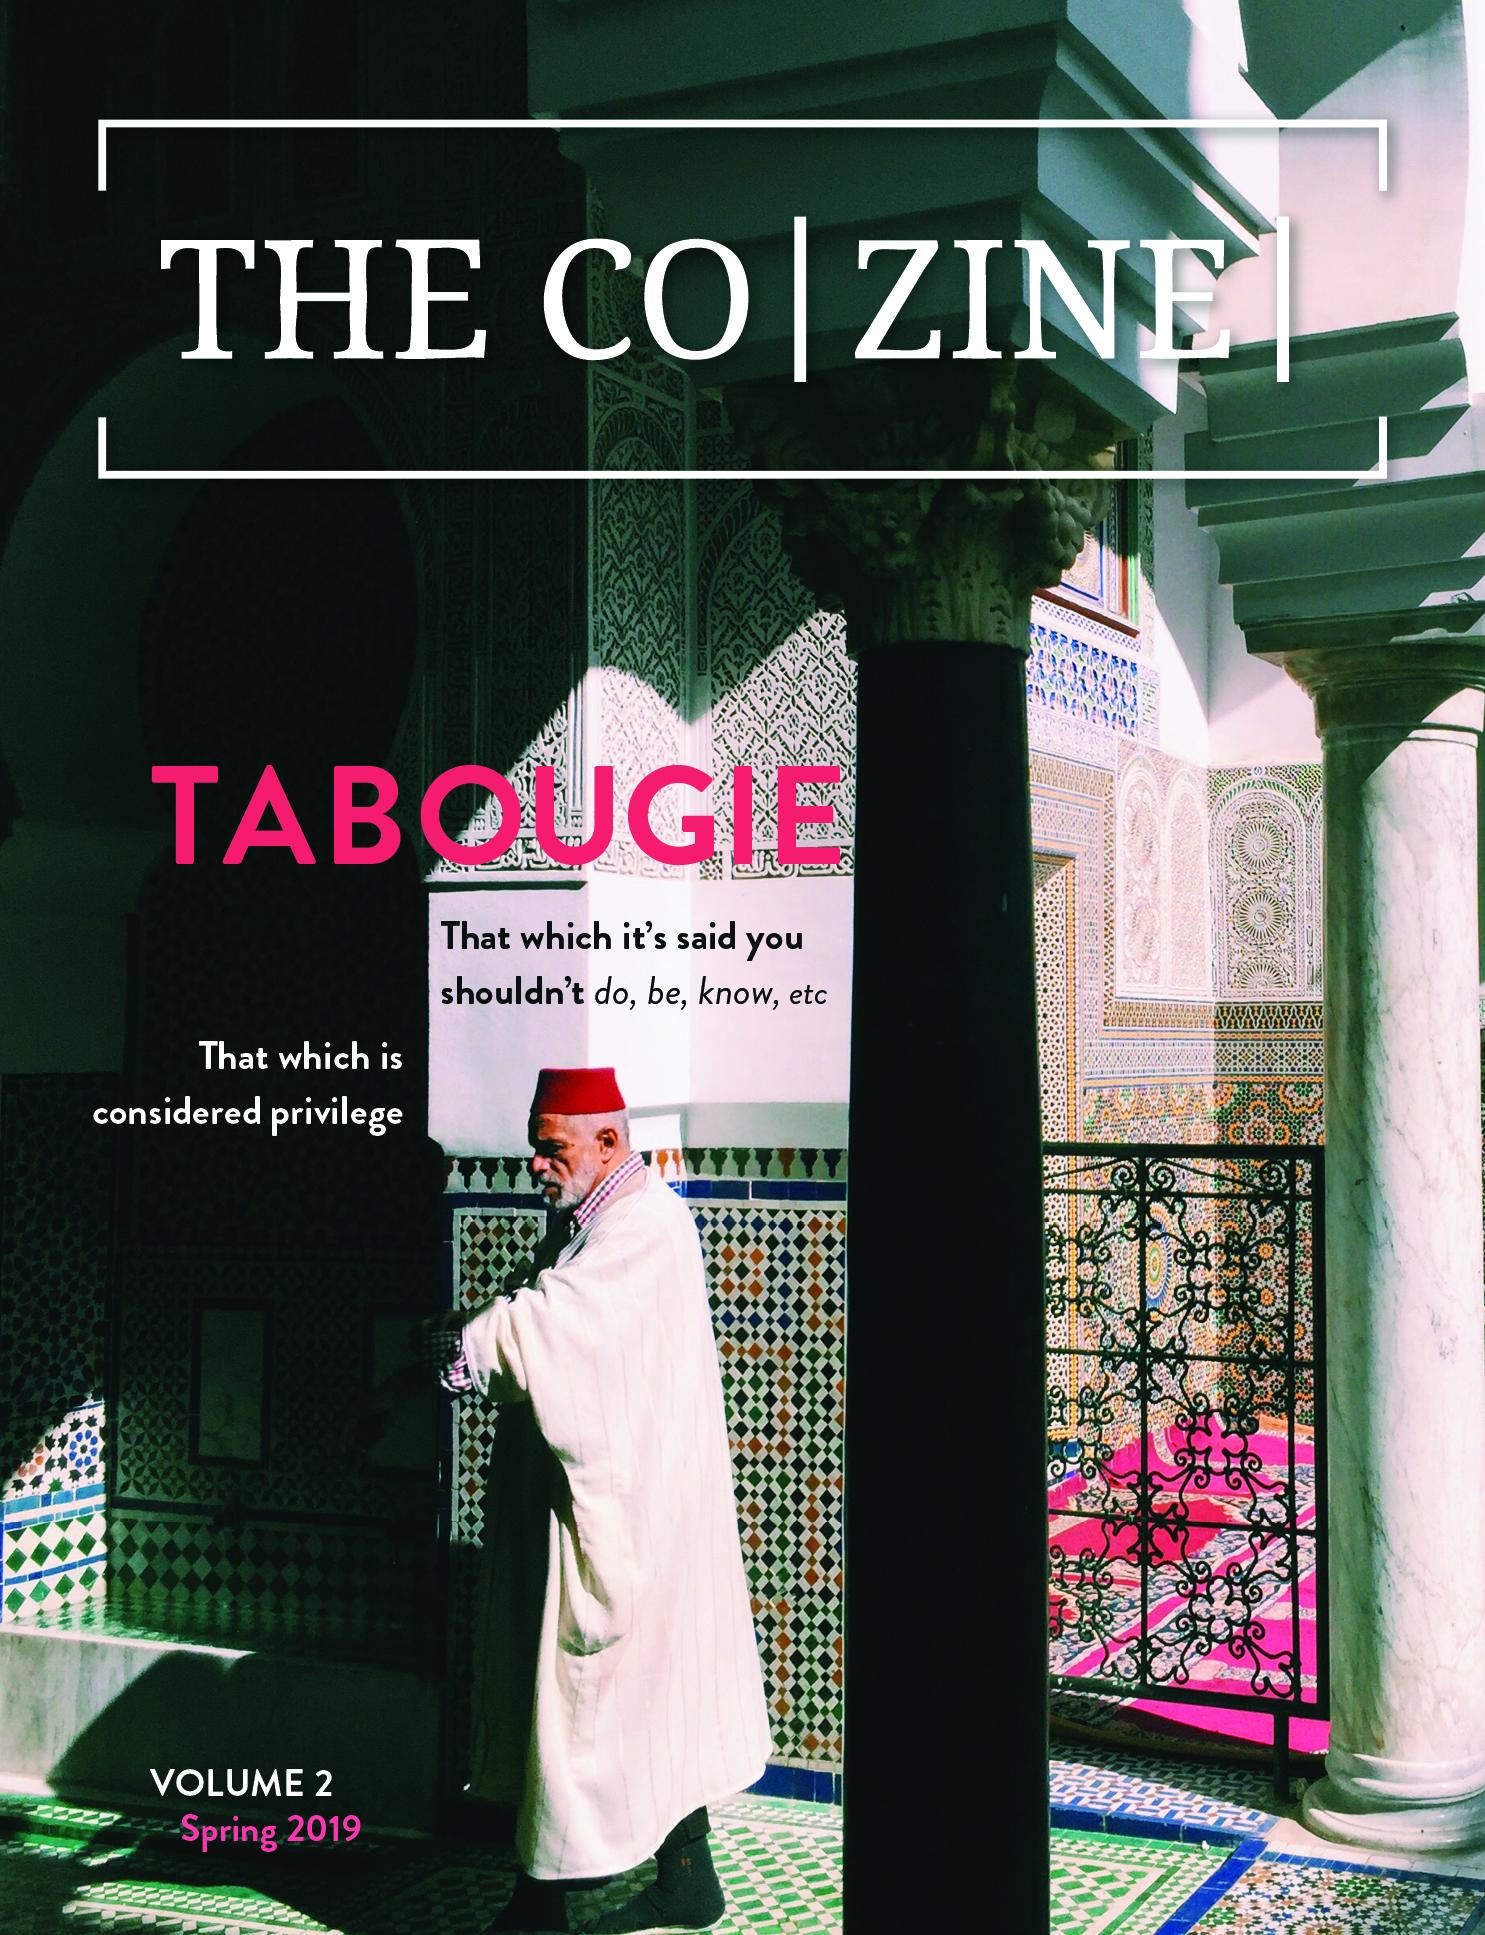 Co-Zine_Vol2_Cover_E.jpg